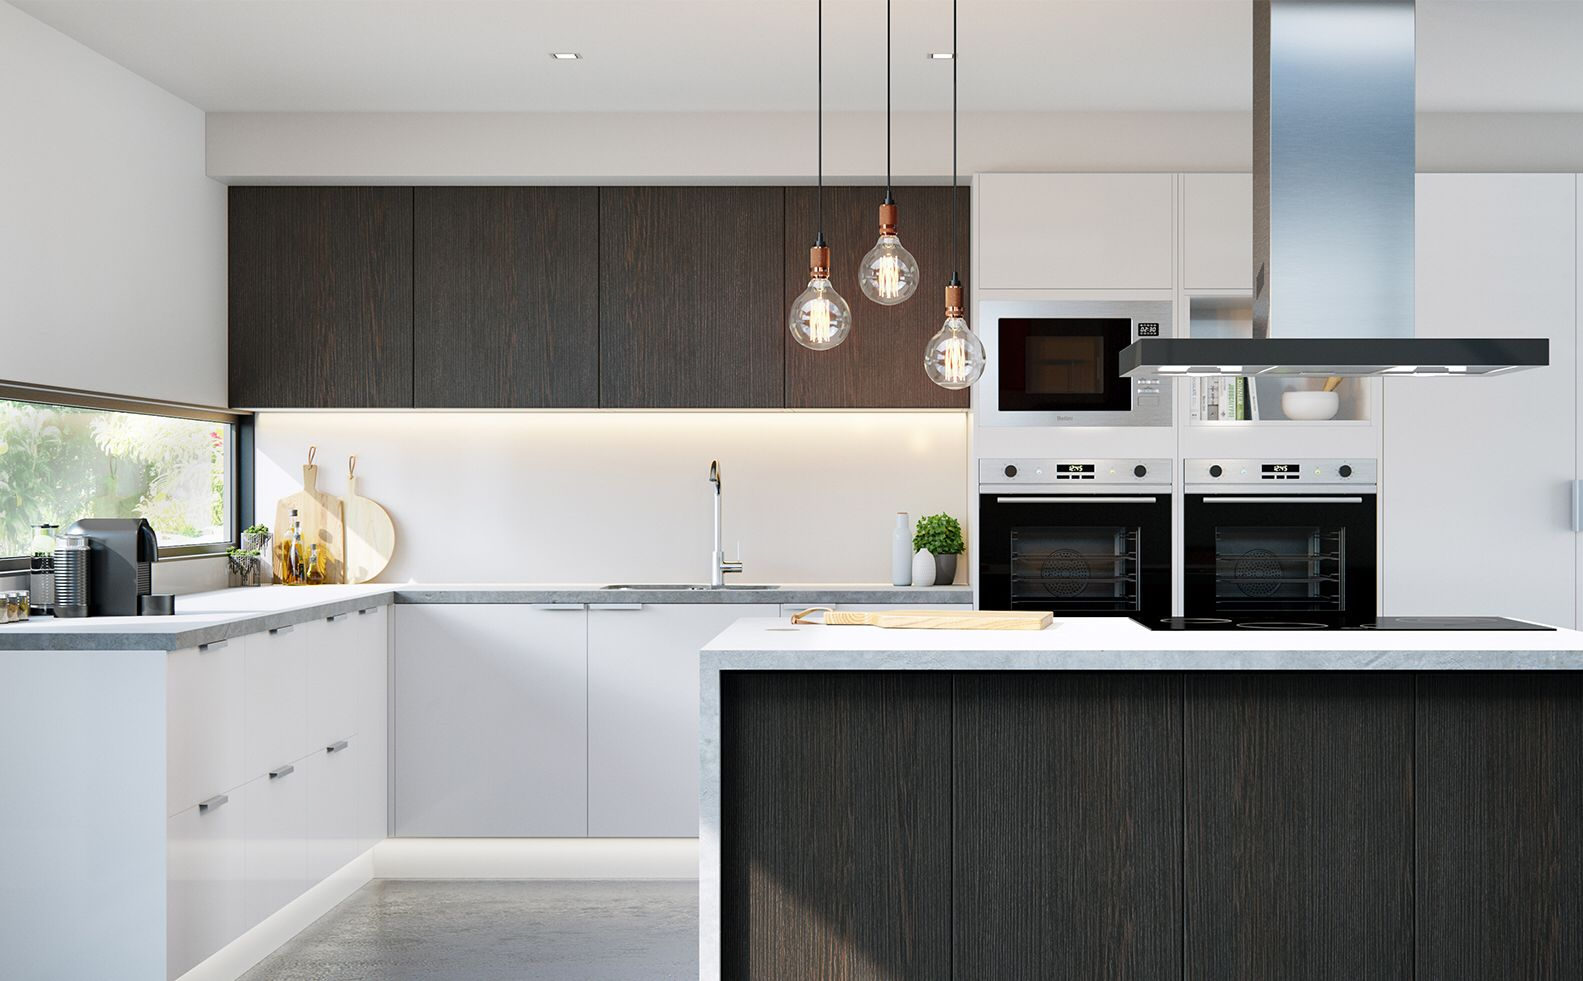 kaboodle kitchen kitchen inspirations on kaboodle kitchen design id=96764